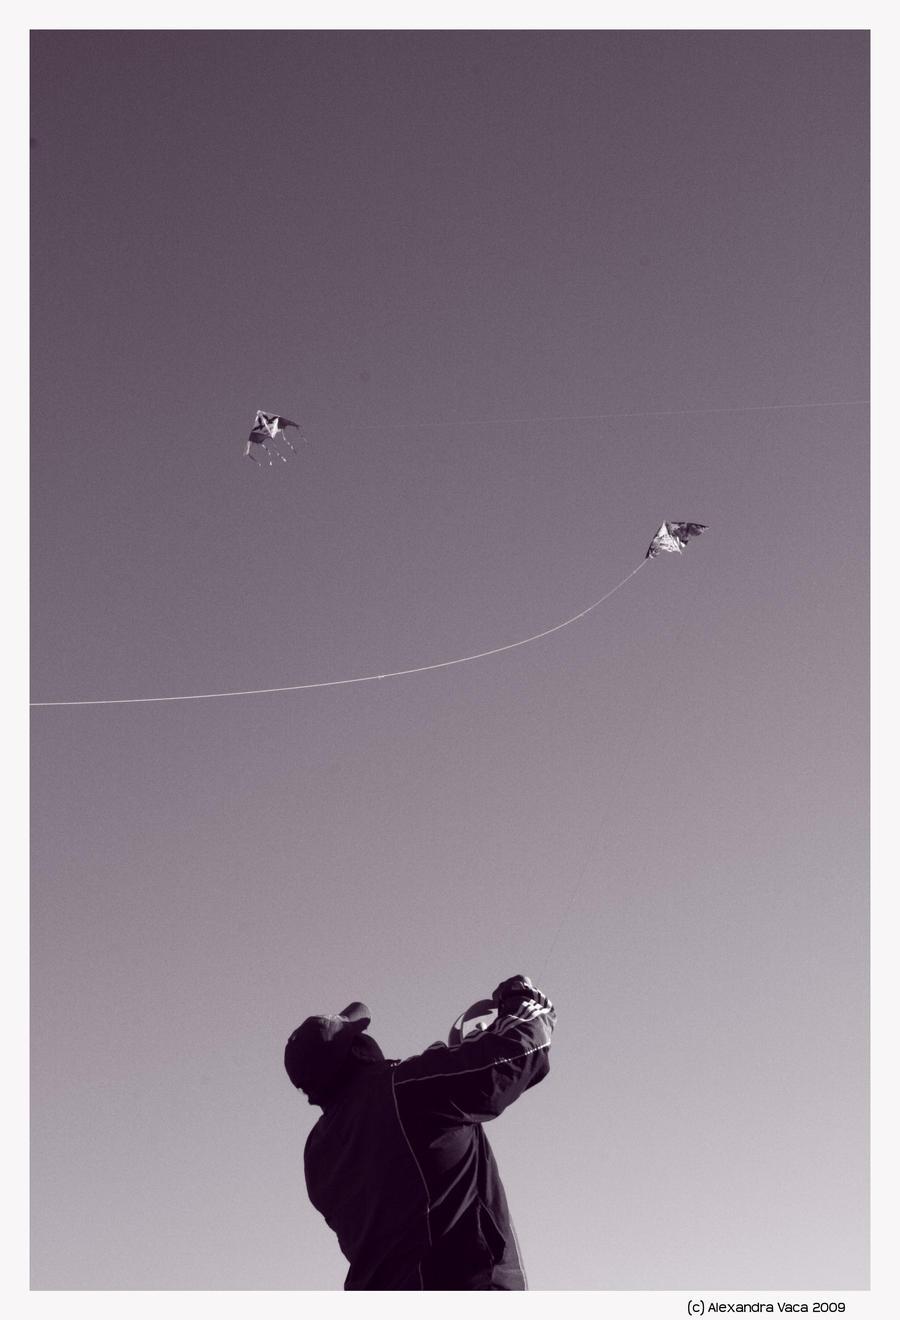 Summer time: Kite by ateneita